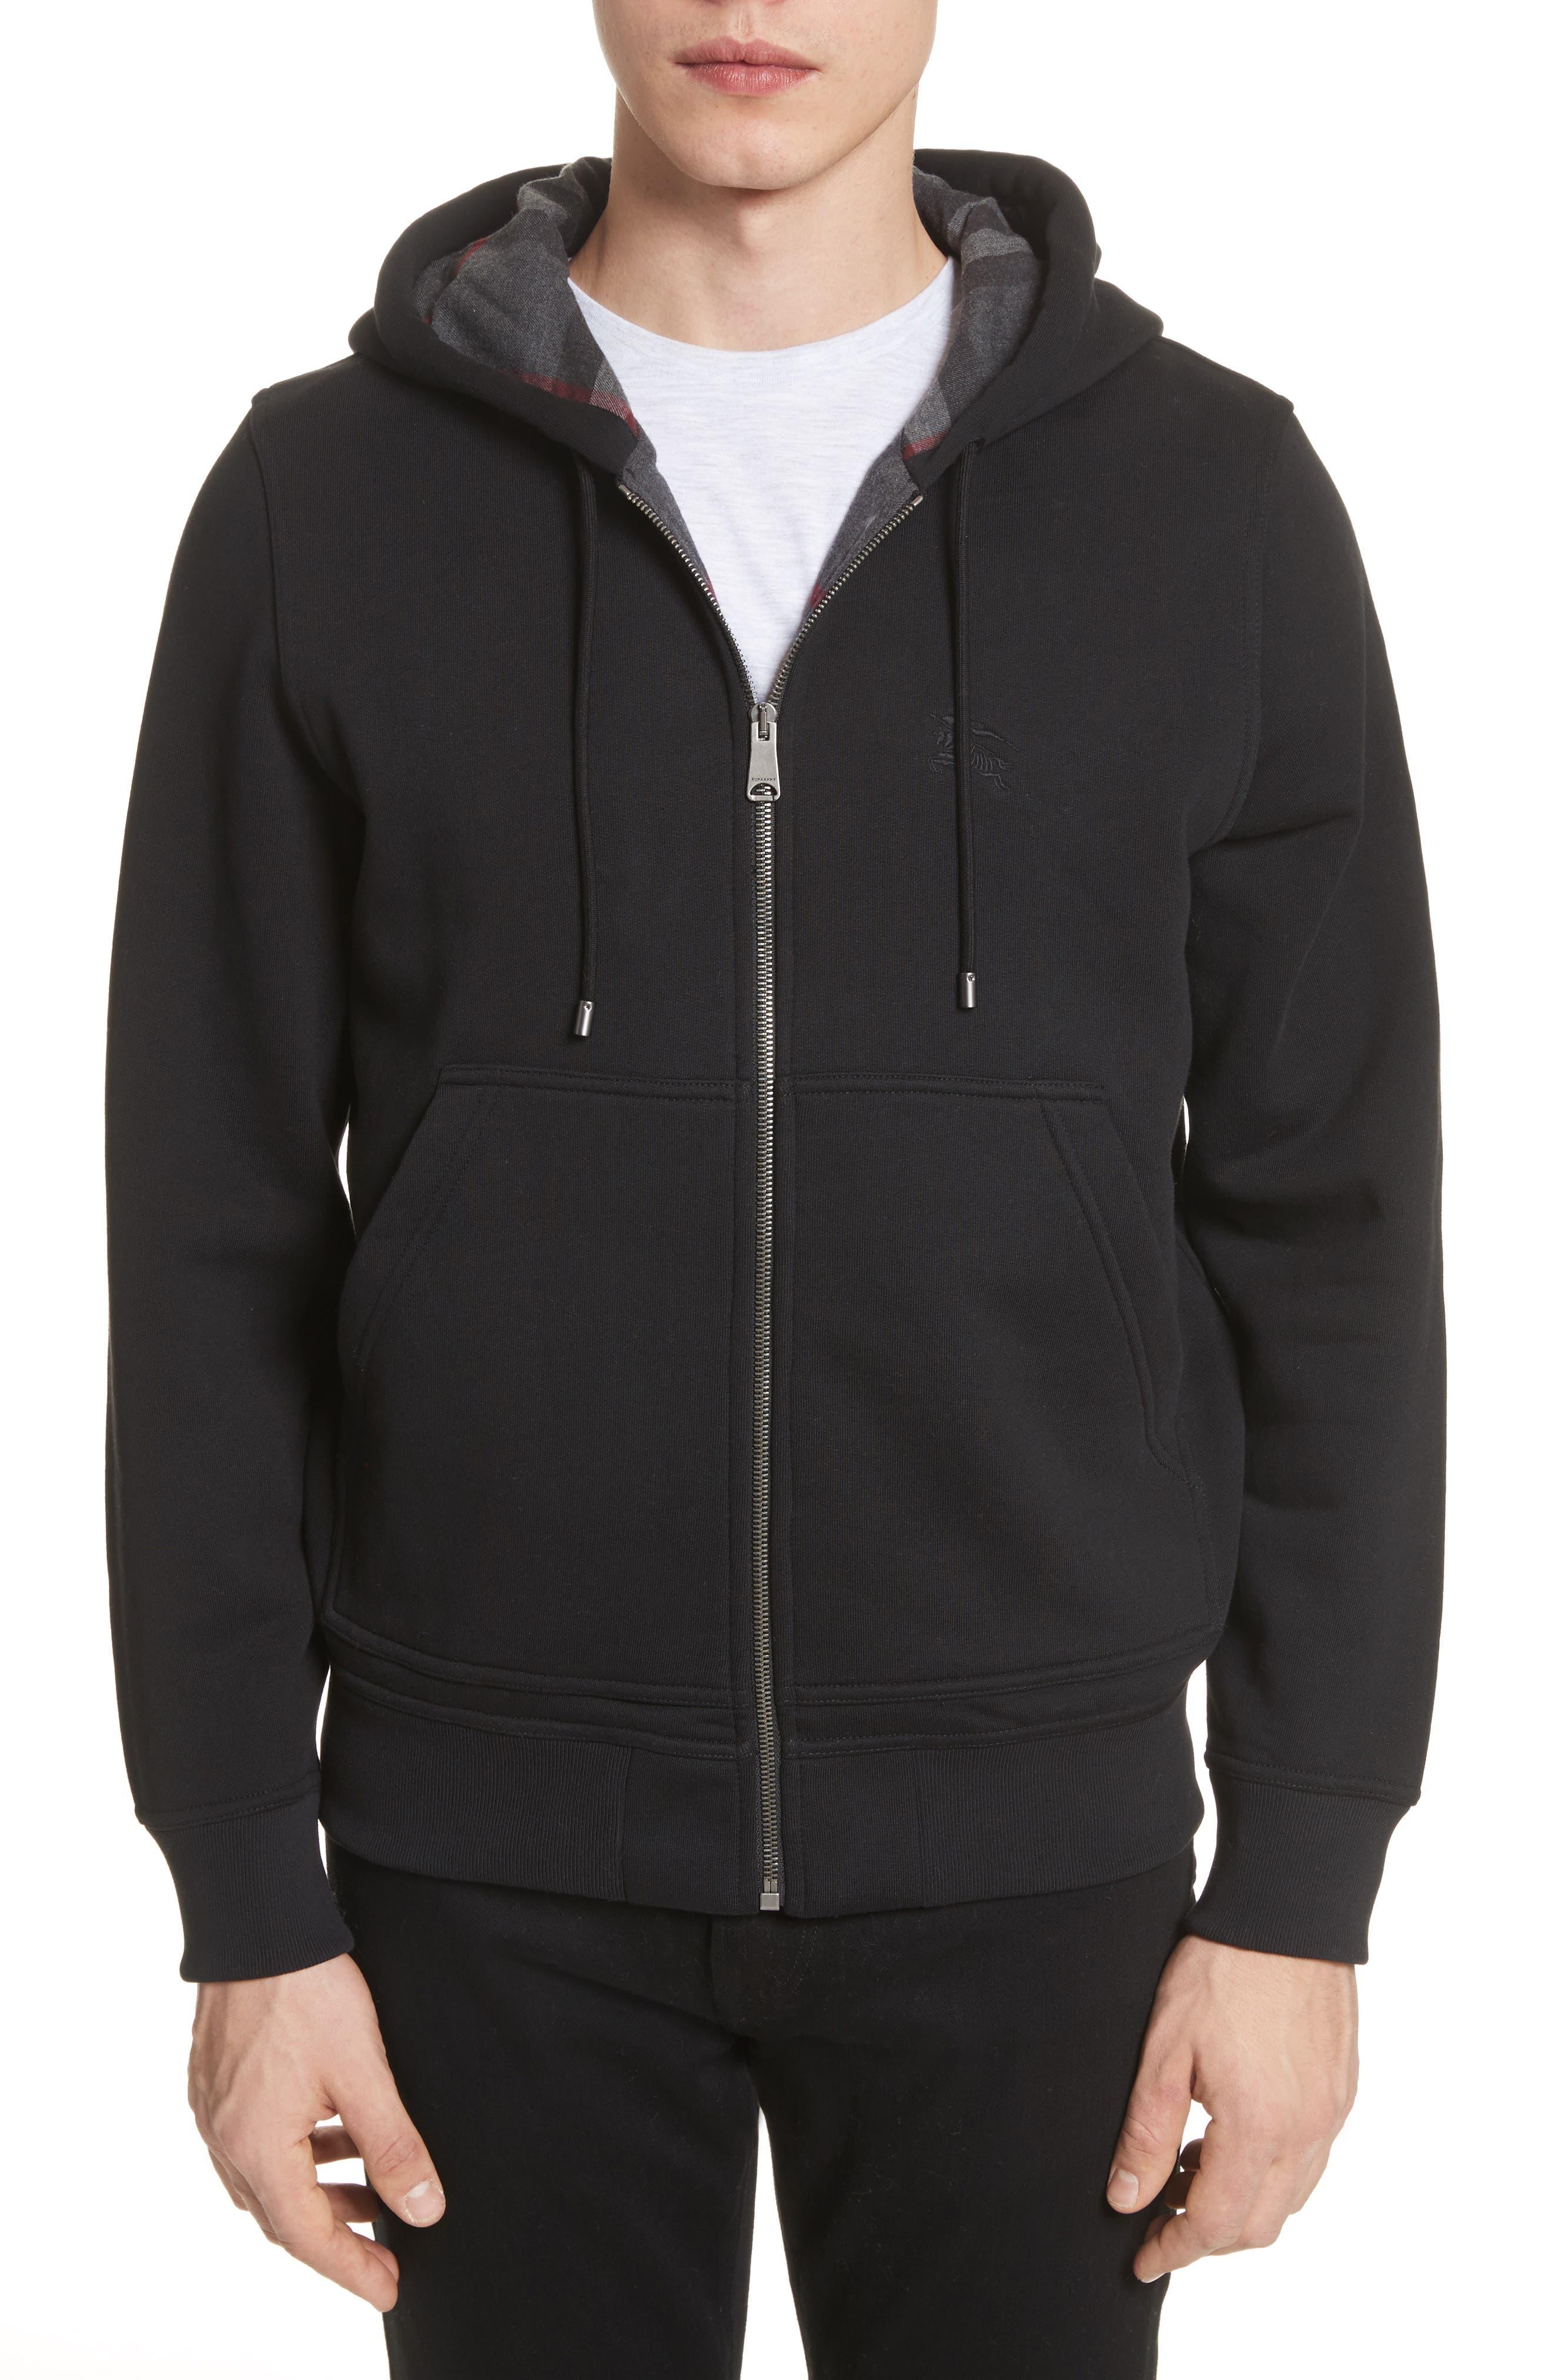 418804dd4e1 Burberry Men s Sweatshirts   Hoodies Jackets